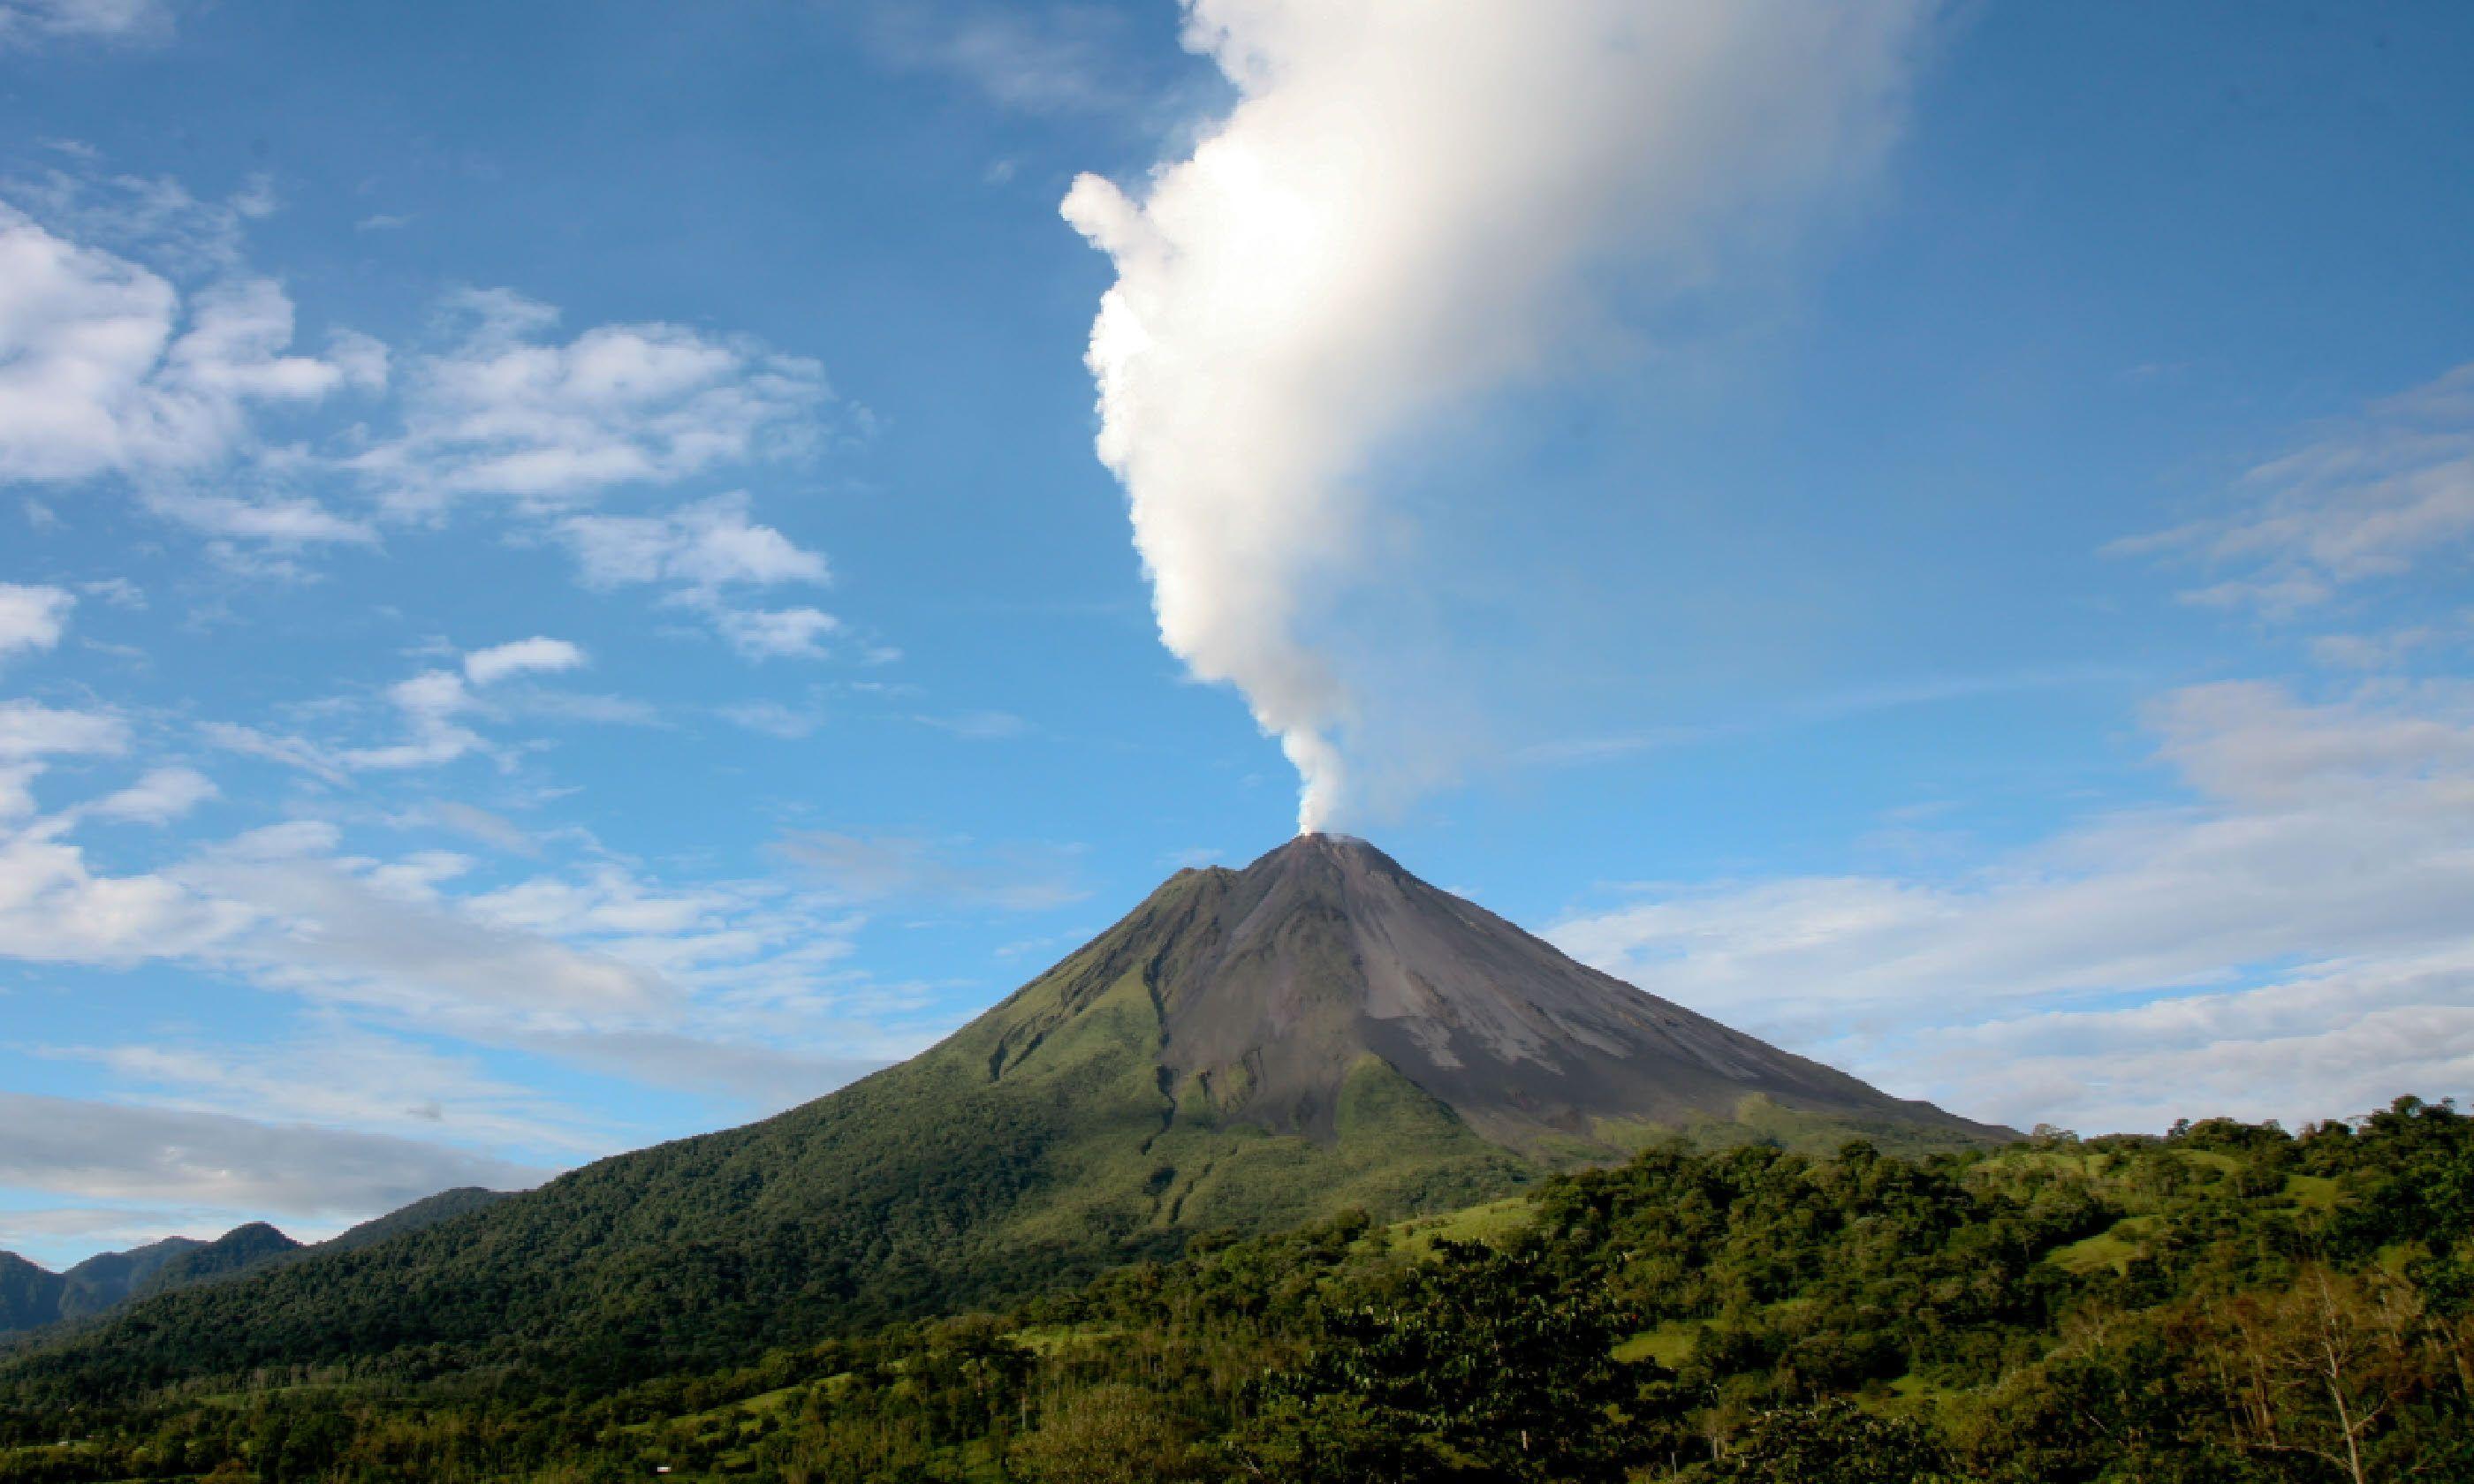 Arenal volcano in Costa Rica (Shutterstock)